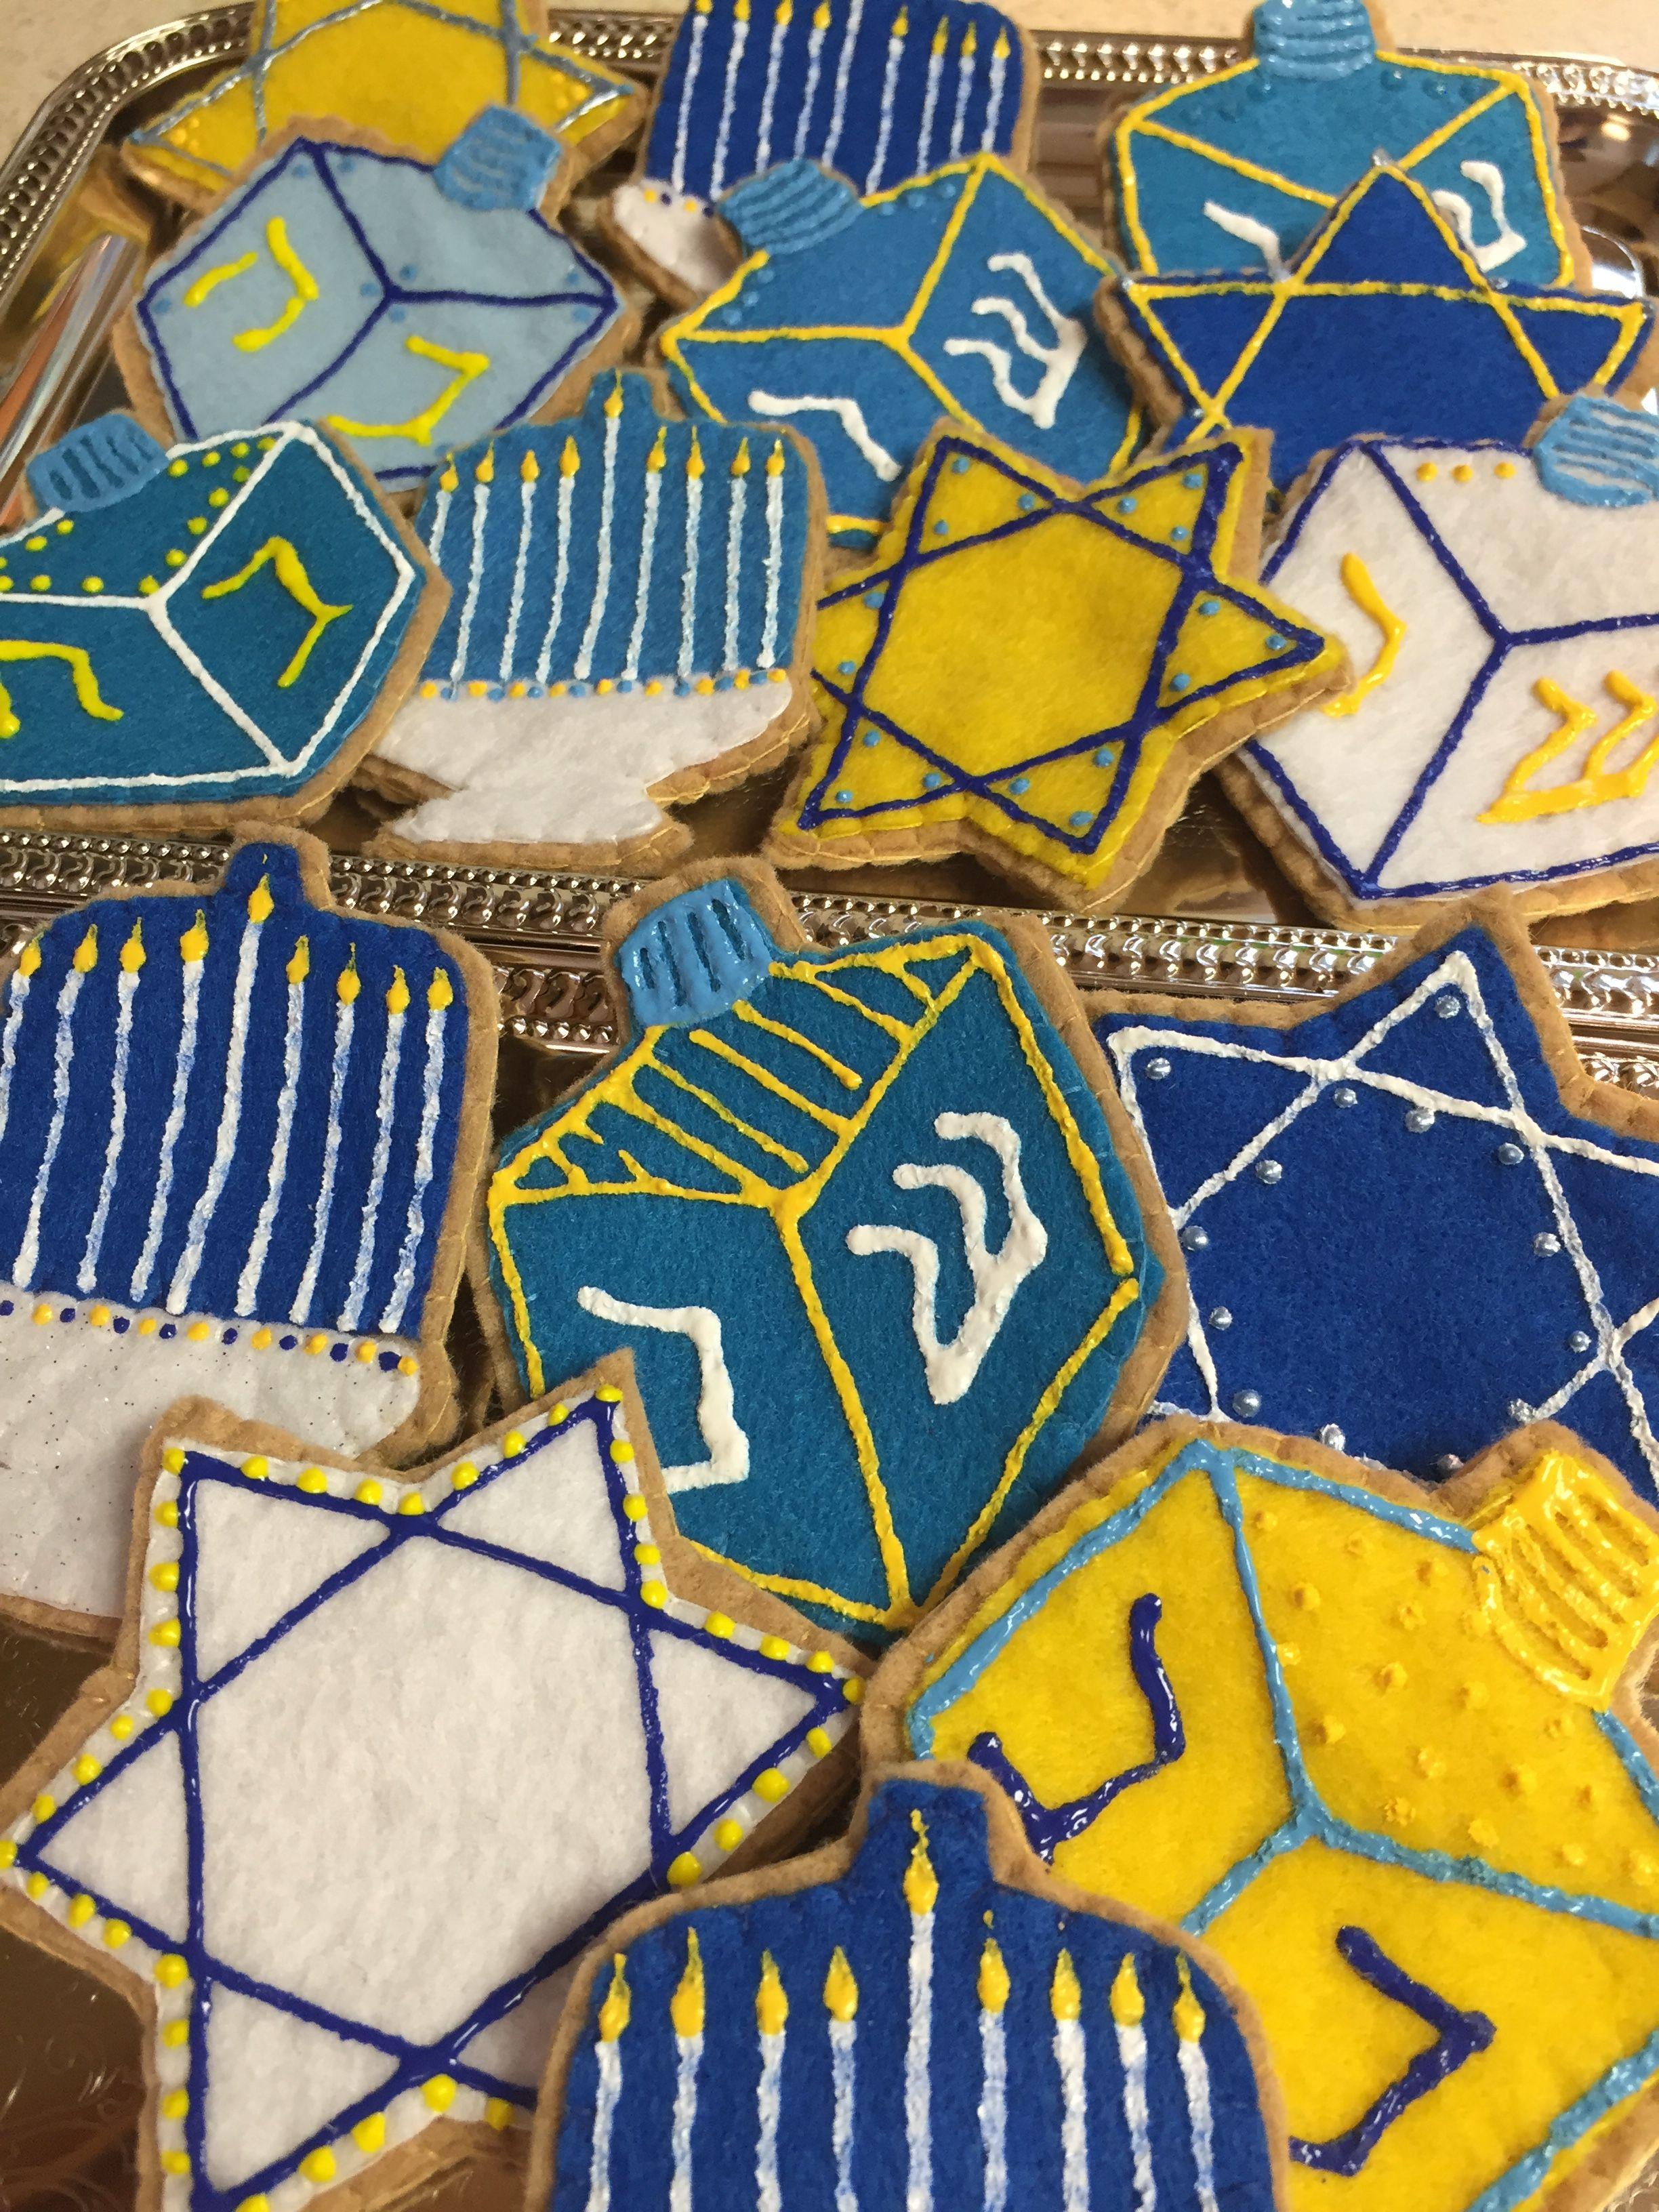 Happy Chanukah cookies! Dramatic Play fun. Order a set at FeltSewReal@aol.com